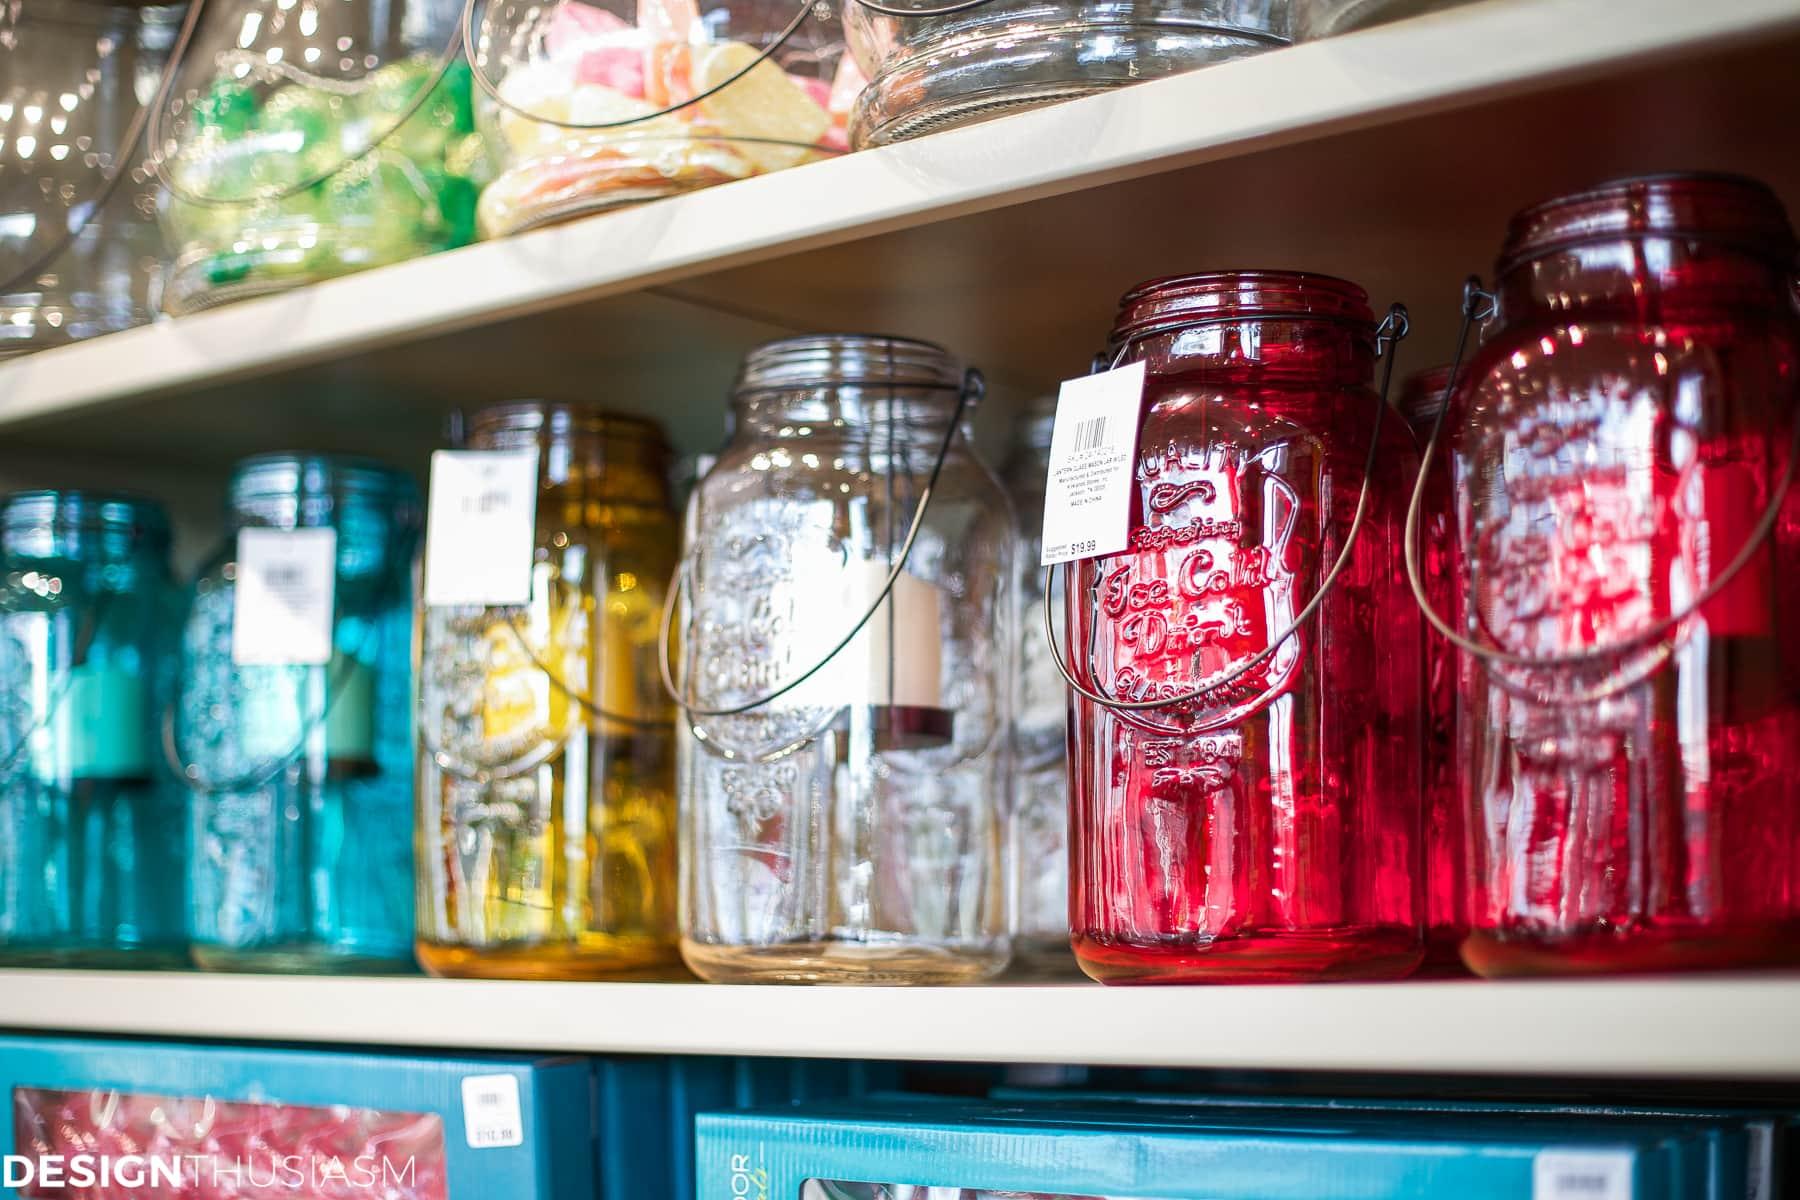 Awesome decorative items - mother daughter shopping spree - designthusiasm.com